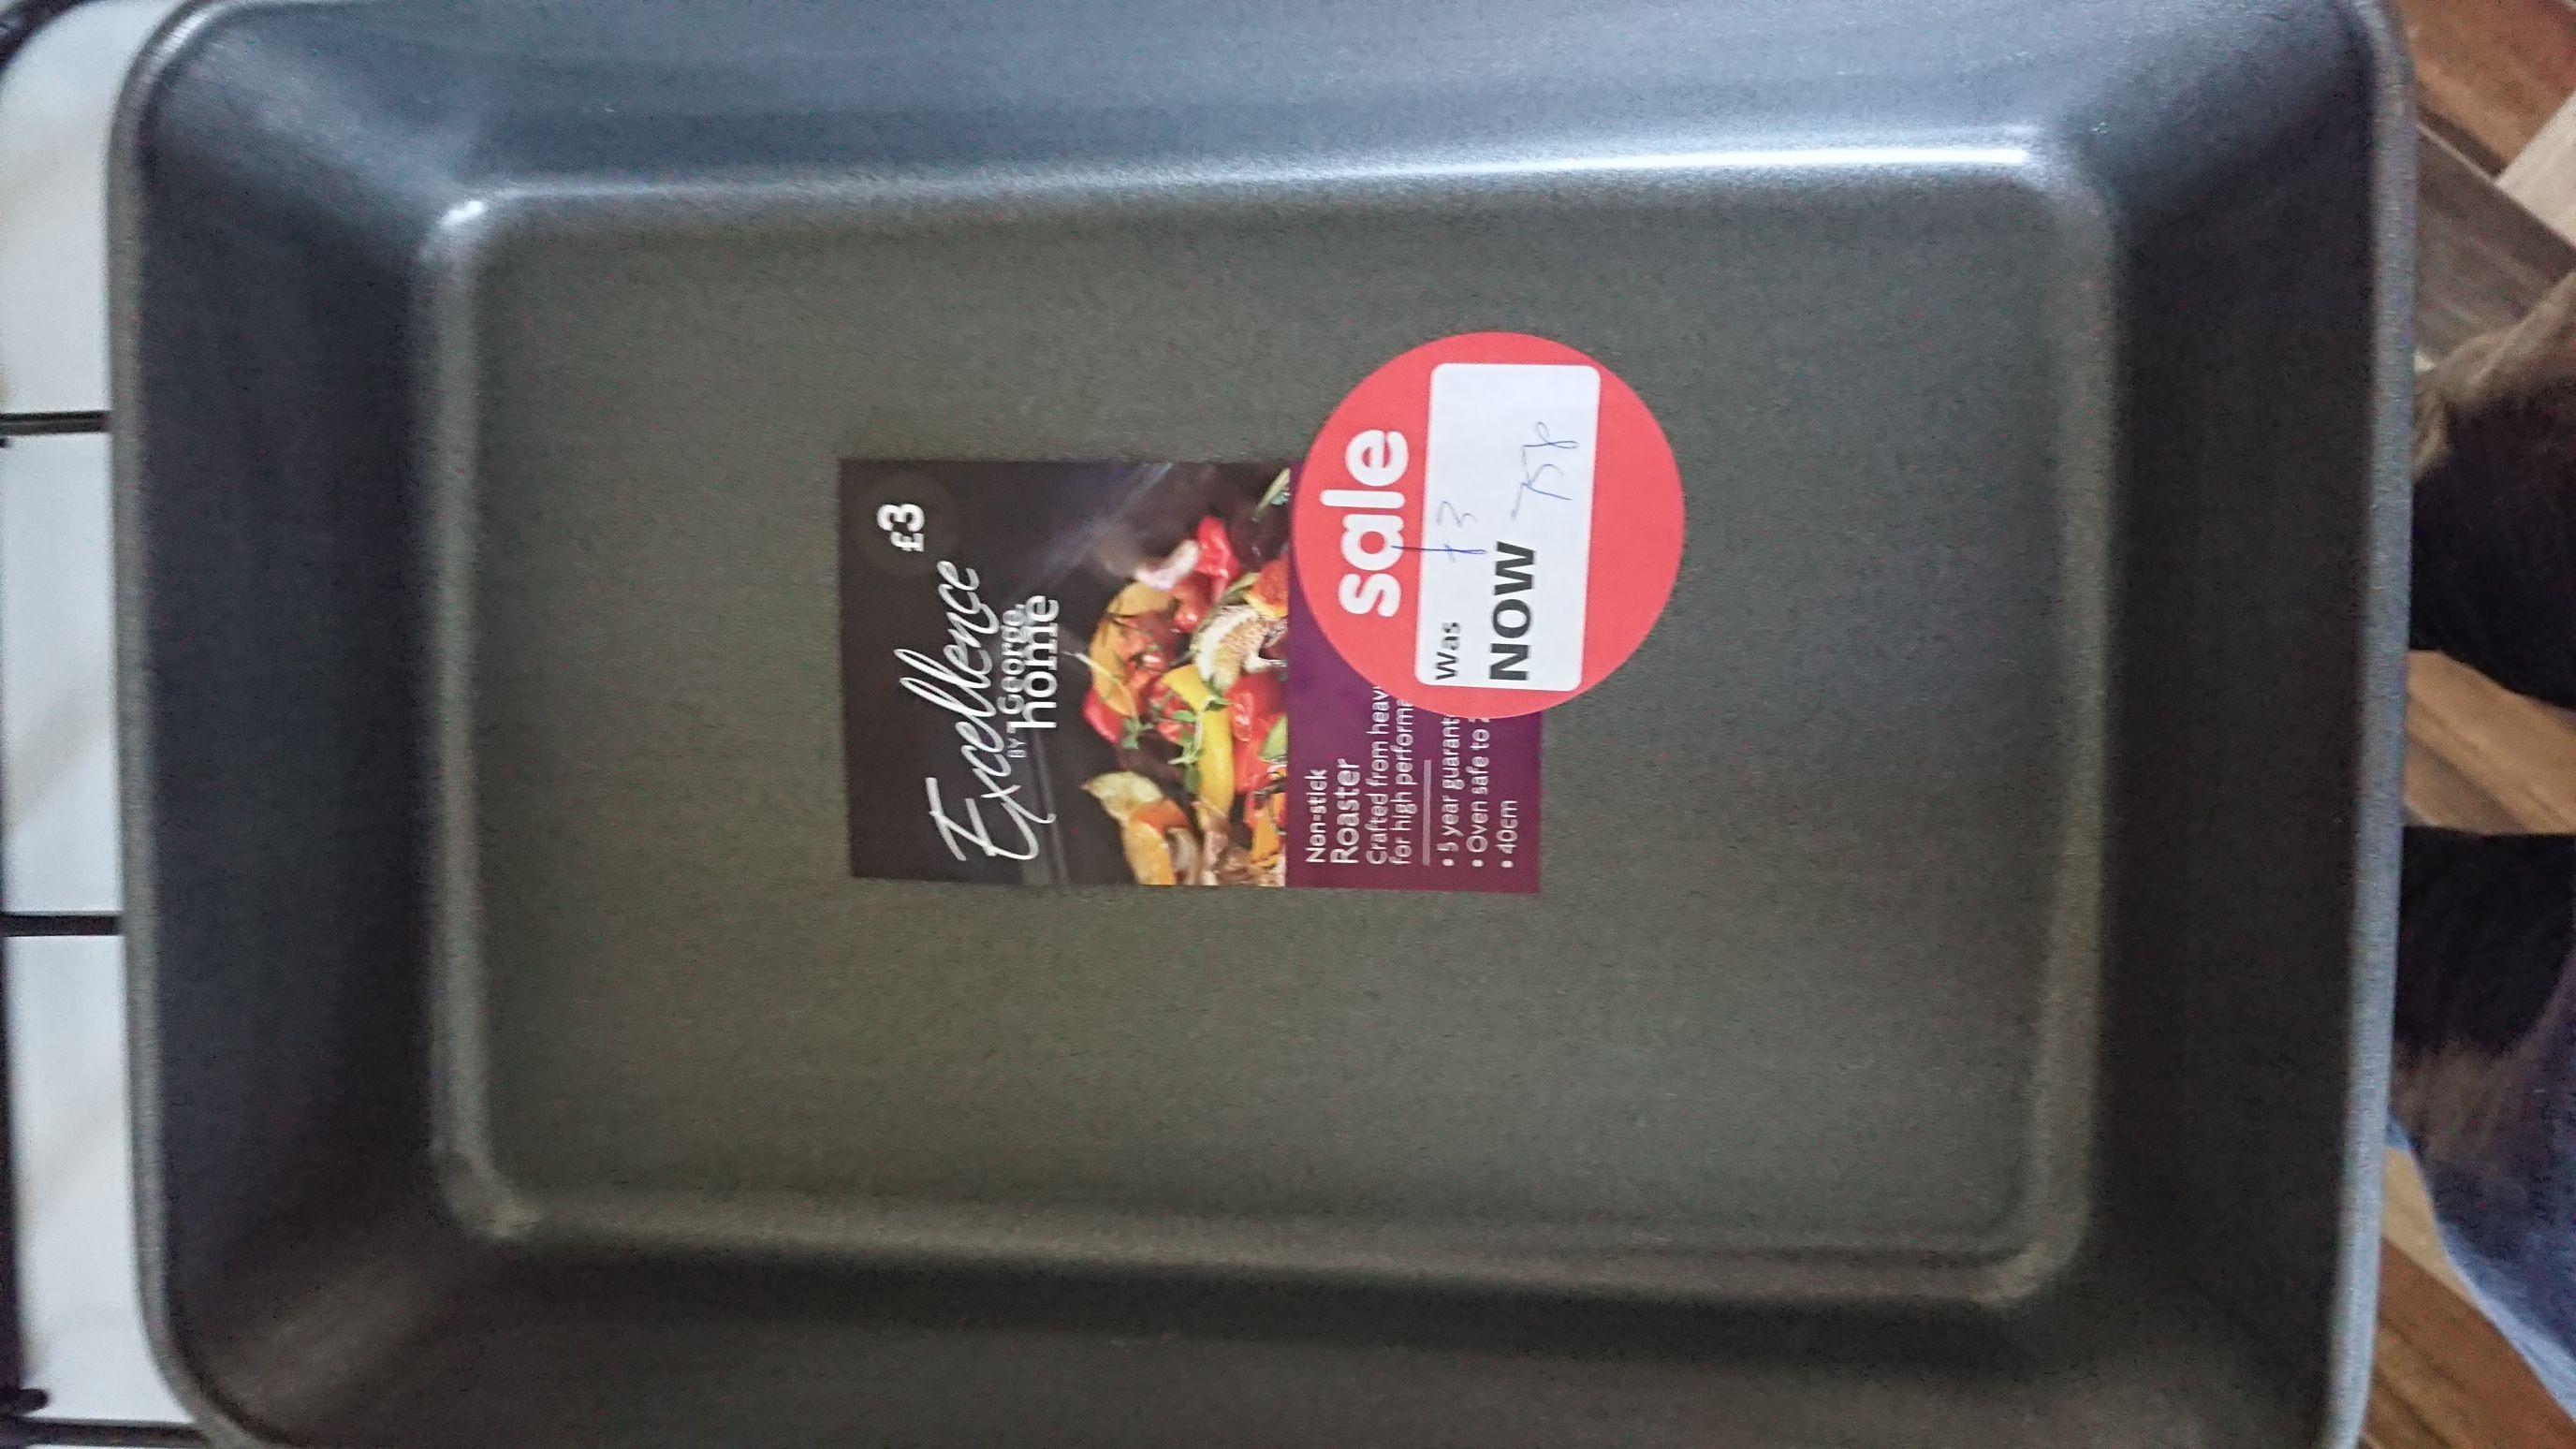 Asda Non-Stick Roaster 75p instore - Bradford Forster Square